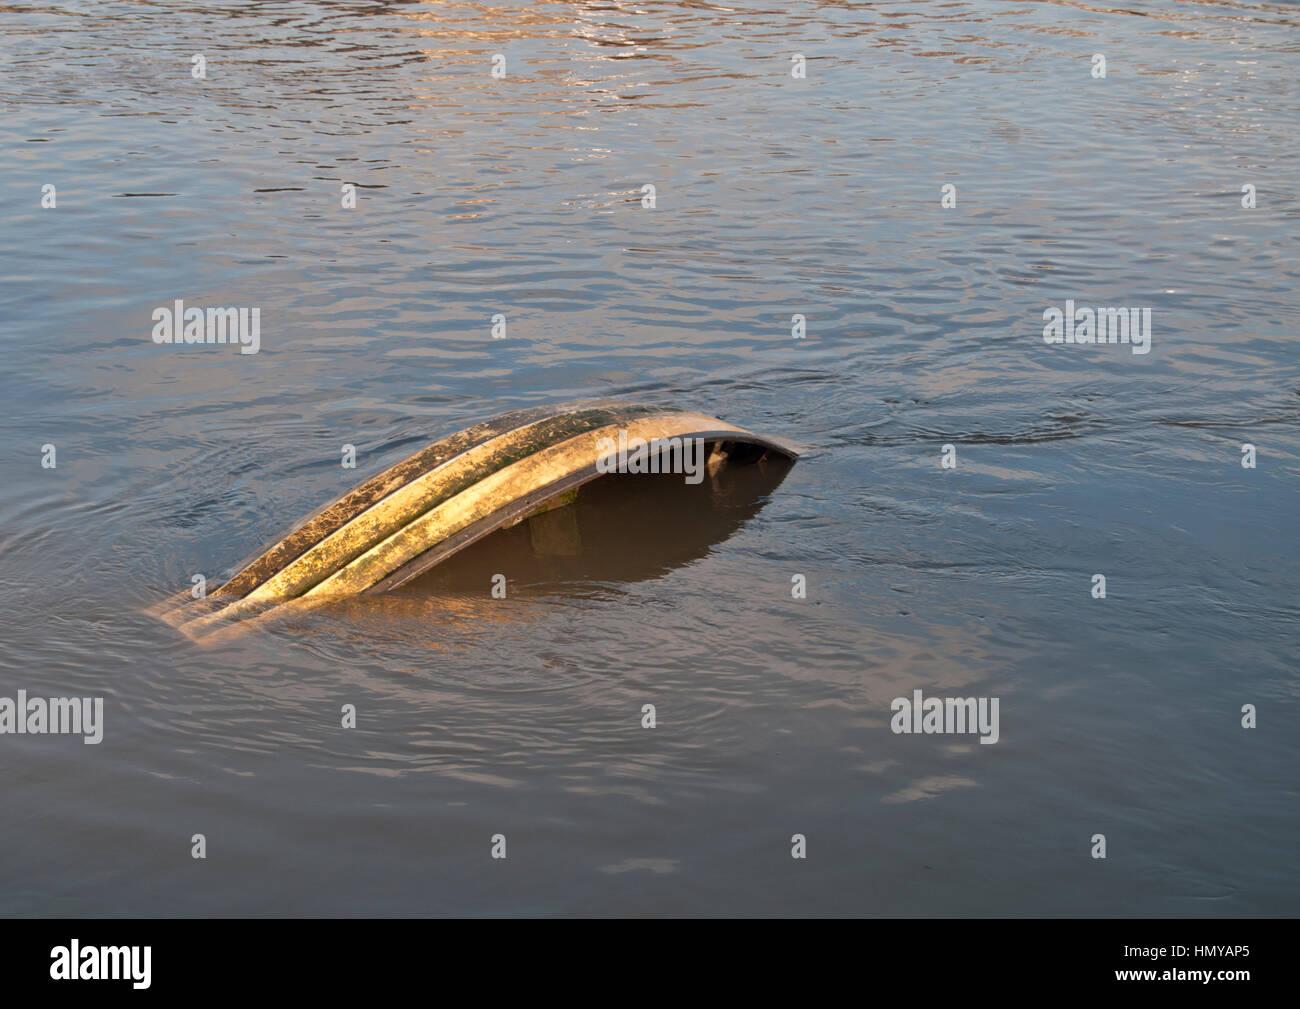 Sunken rowing boat after heavy rain on the river wear., - Stock Image